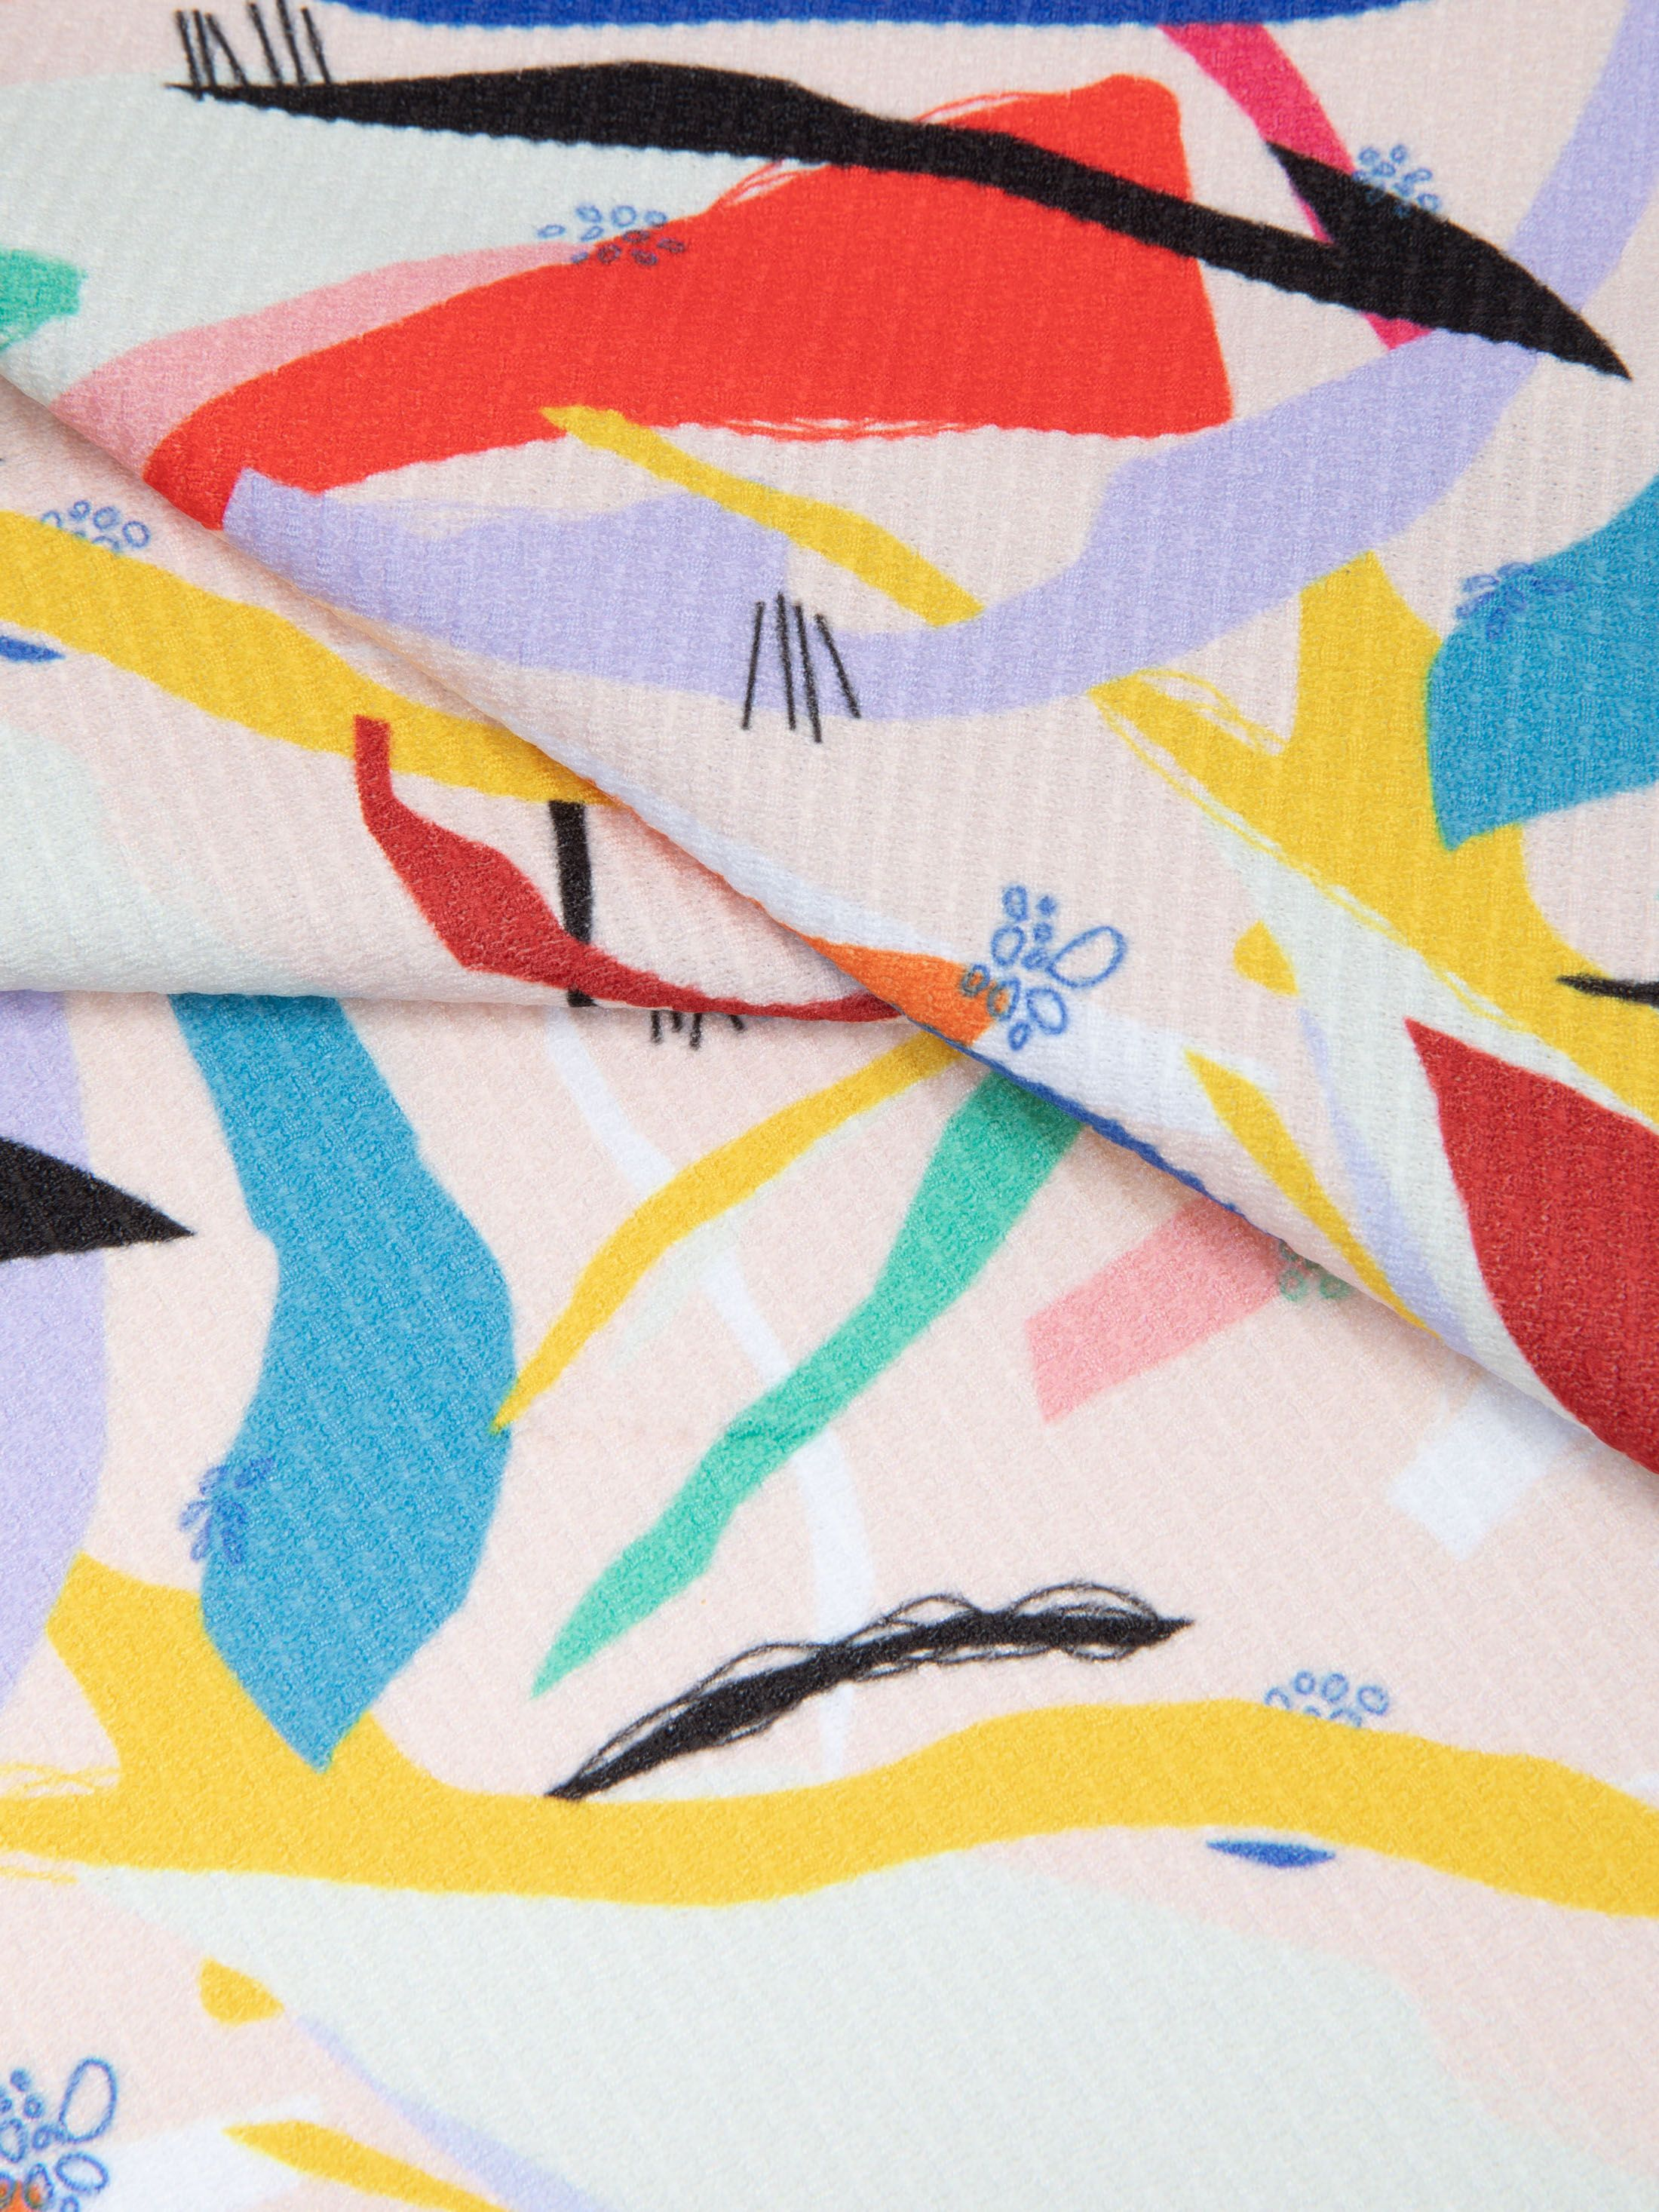 custom made Chain Jersey fabric pinned